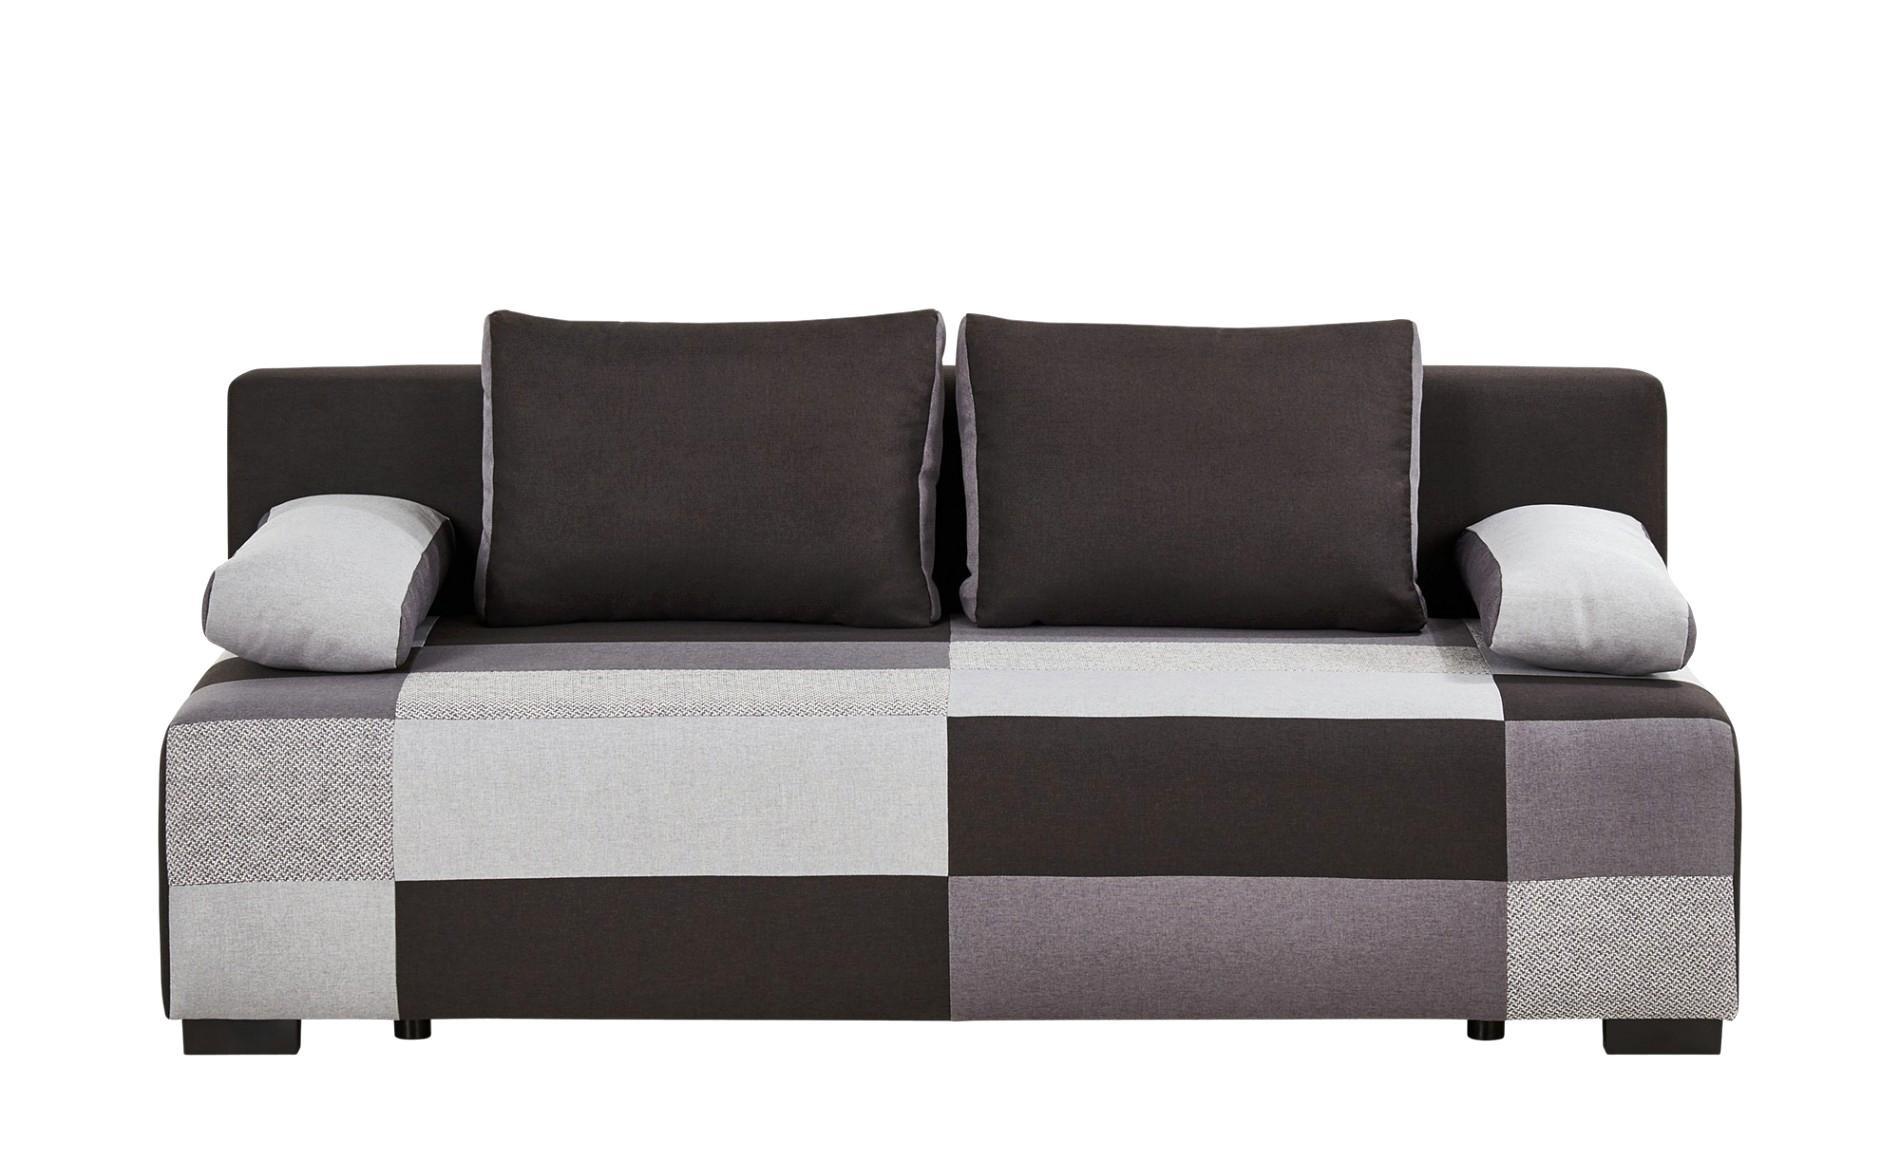 hotel sleeper sofa new ausklappbares sofa elegant couch jugendzimmer 0d foto schlafsofa of hotel sleeper sofa